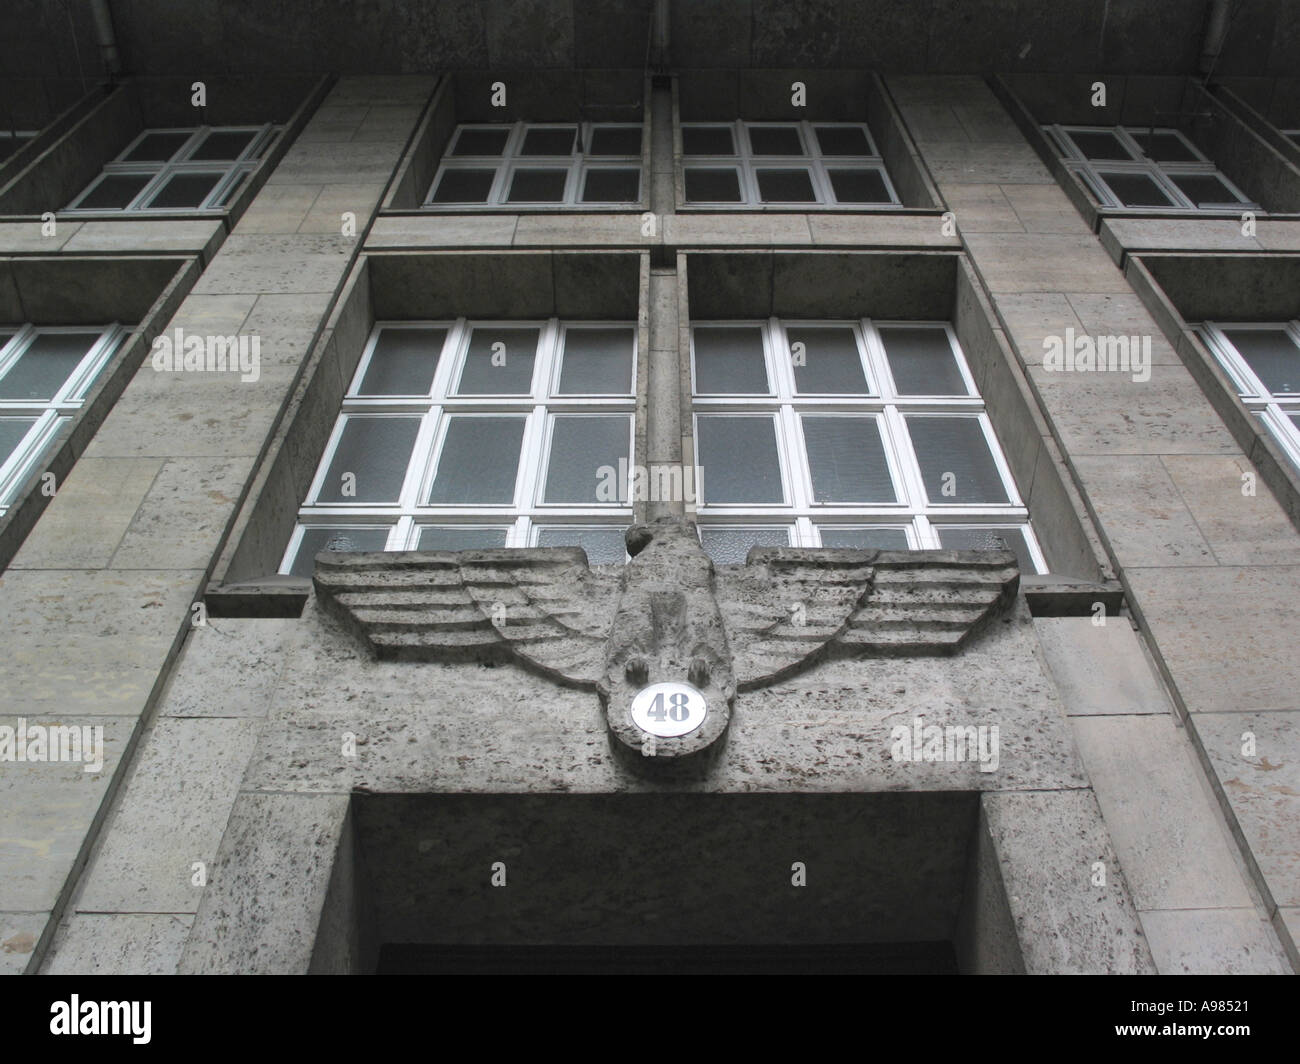 Nazi eagle Berlin Germany 2003  - Stock Image